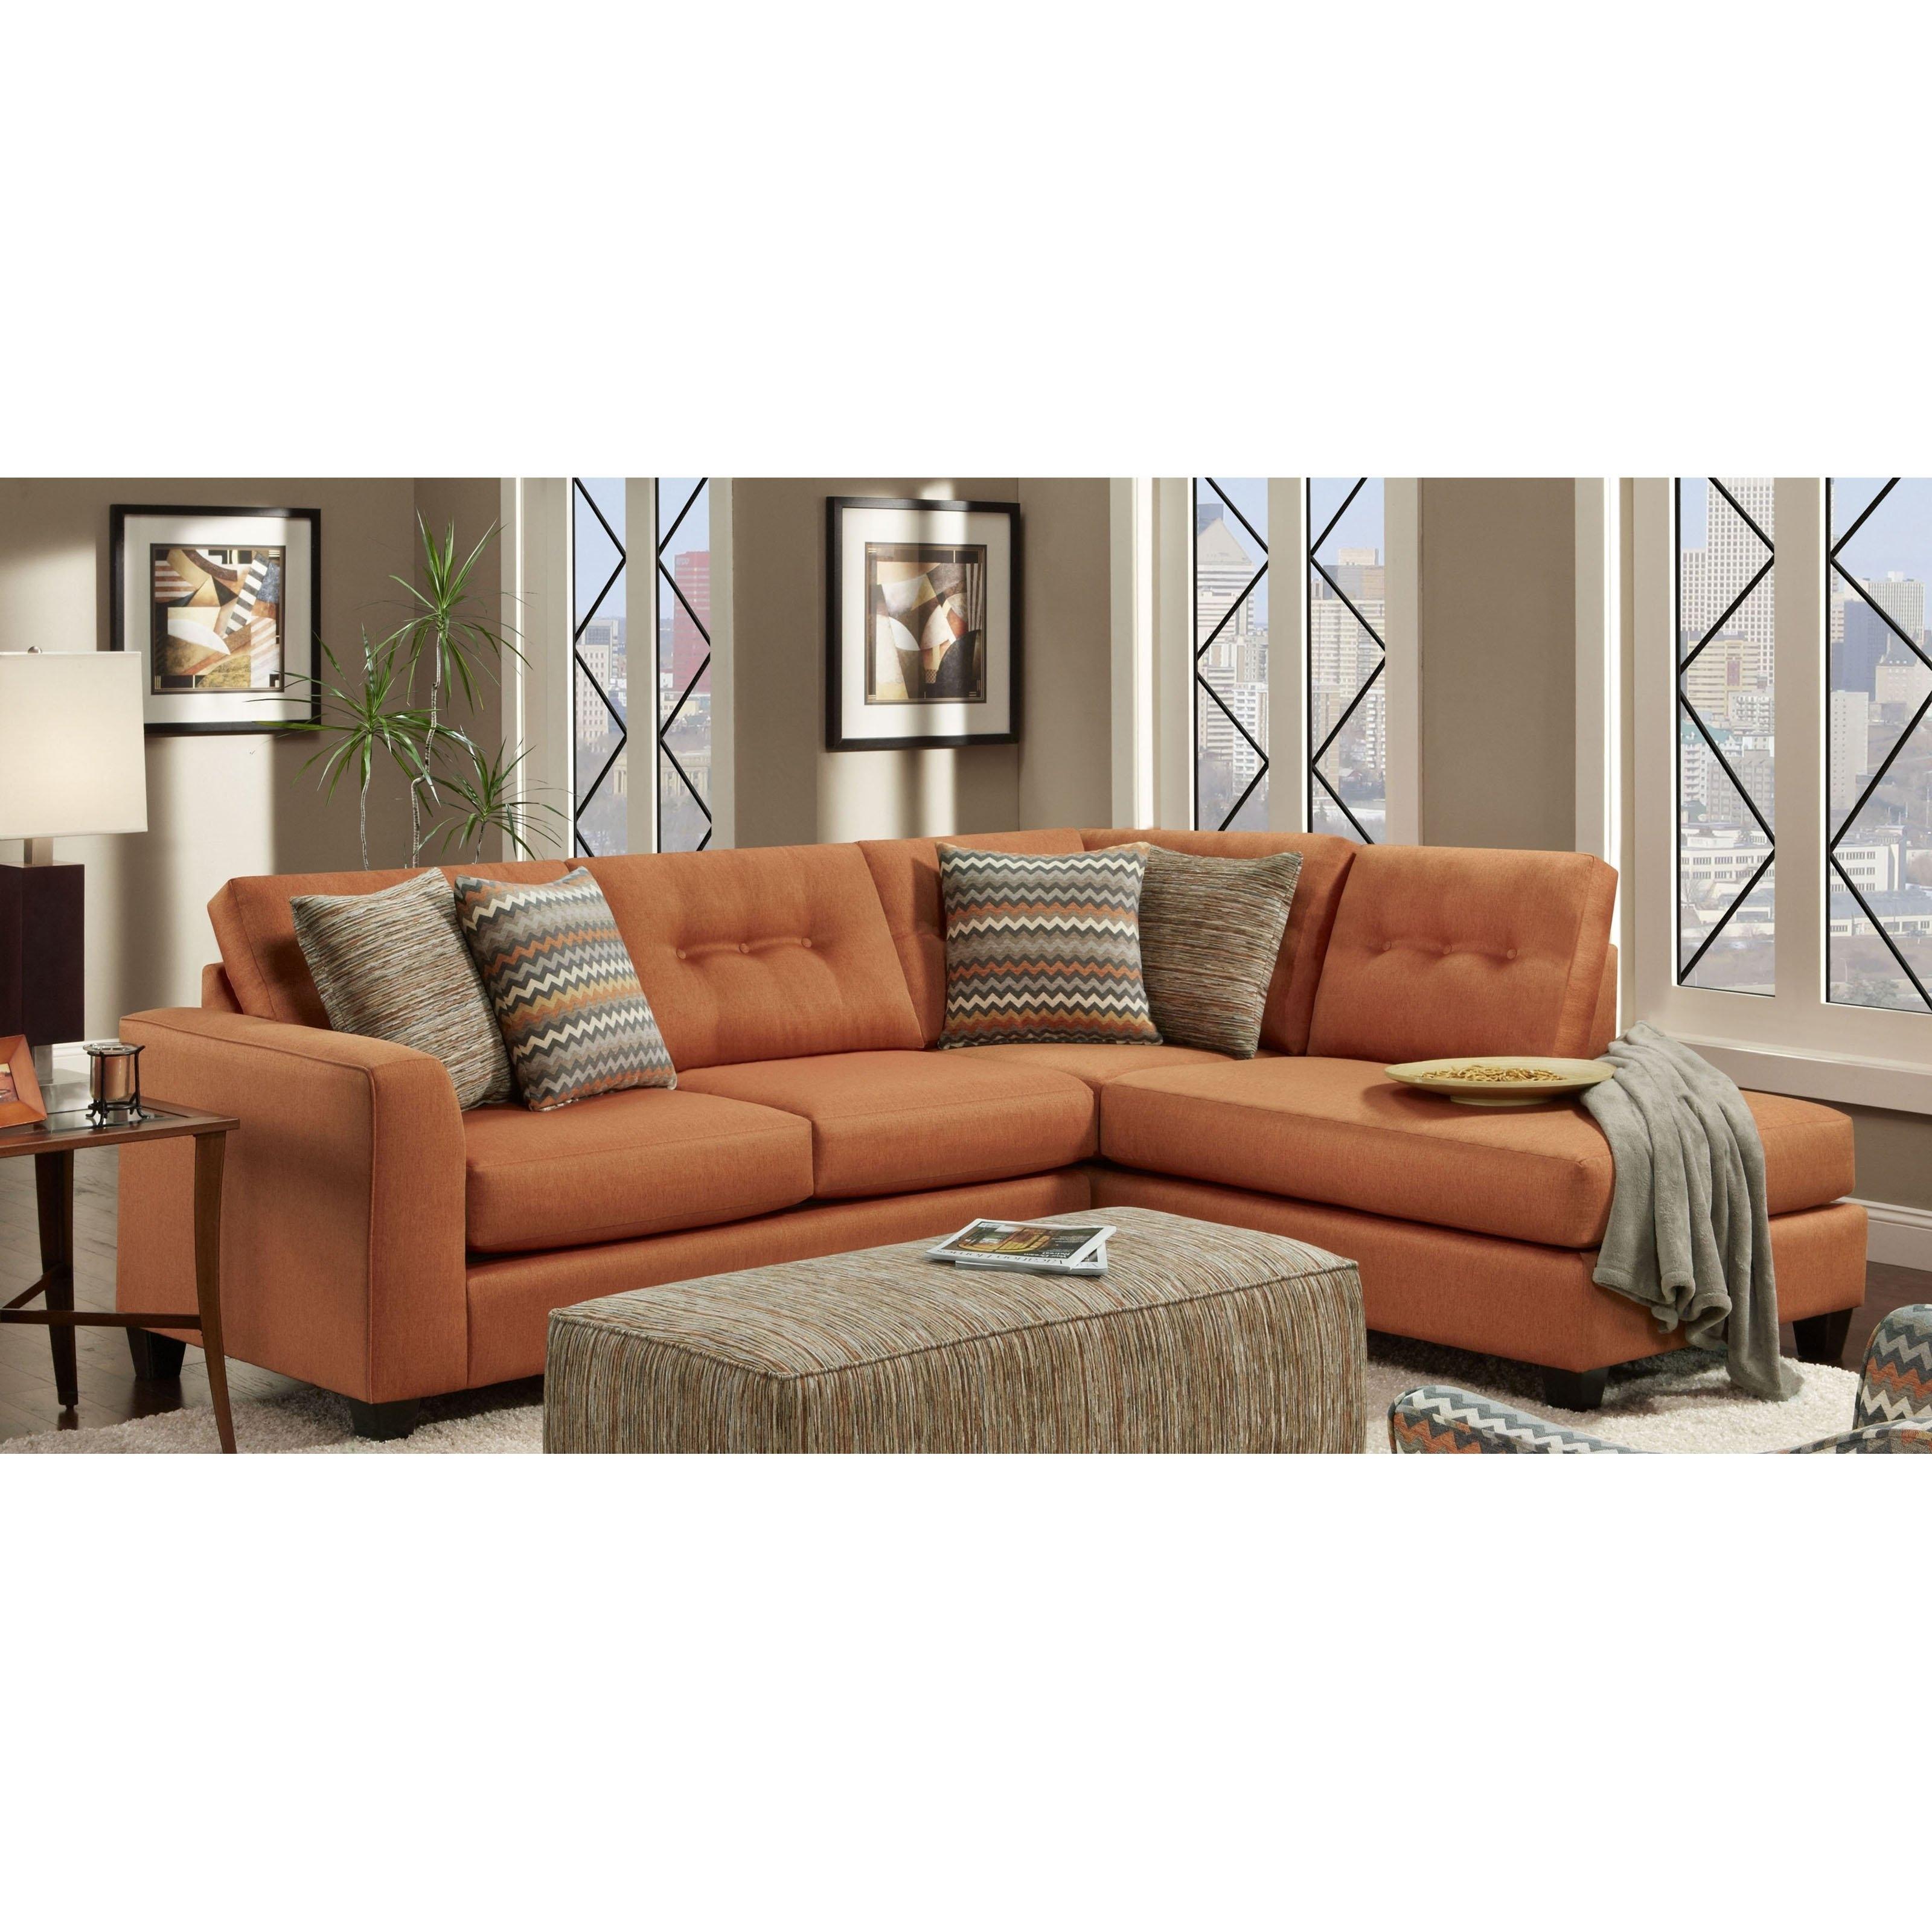 Chelsea Home Furniture Phoenix Sectional Sofa – Walmart In Phoenix Sectional Sofas (View 6 of 10)